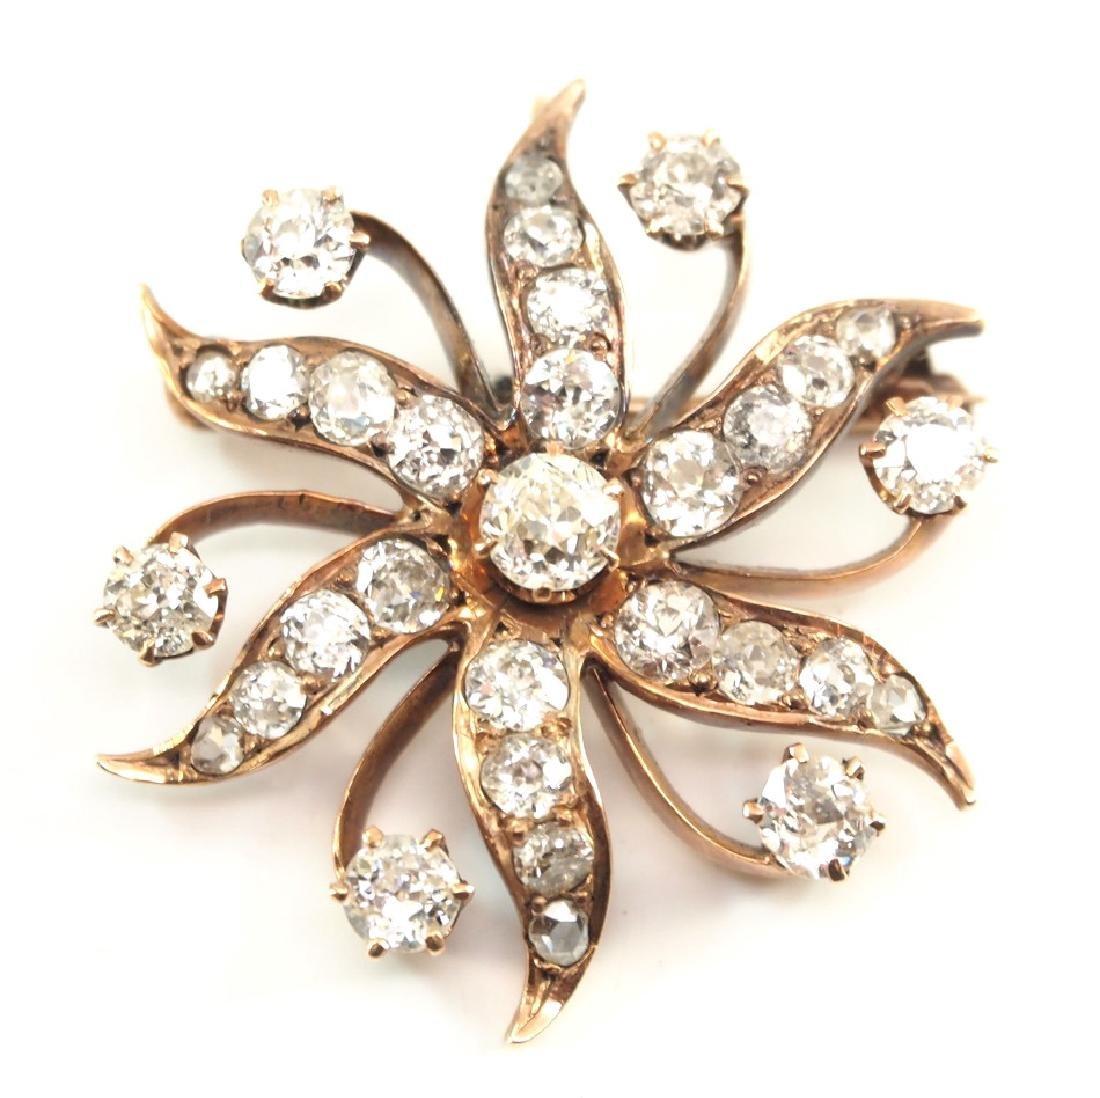 14 kt yellow gold & diamond pendant/brooch